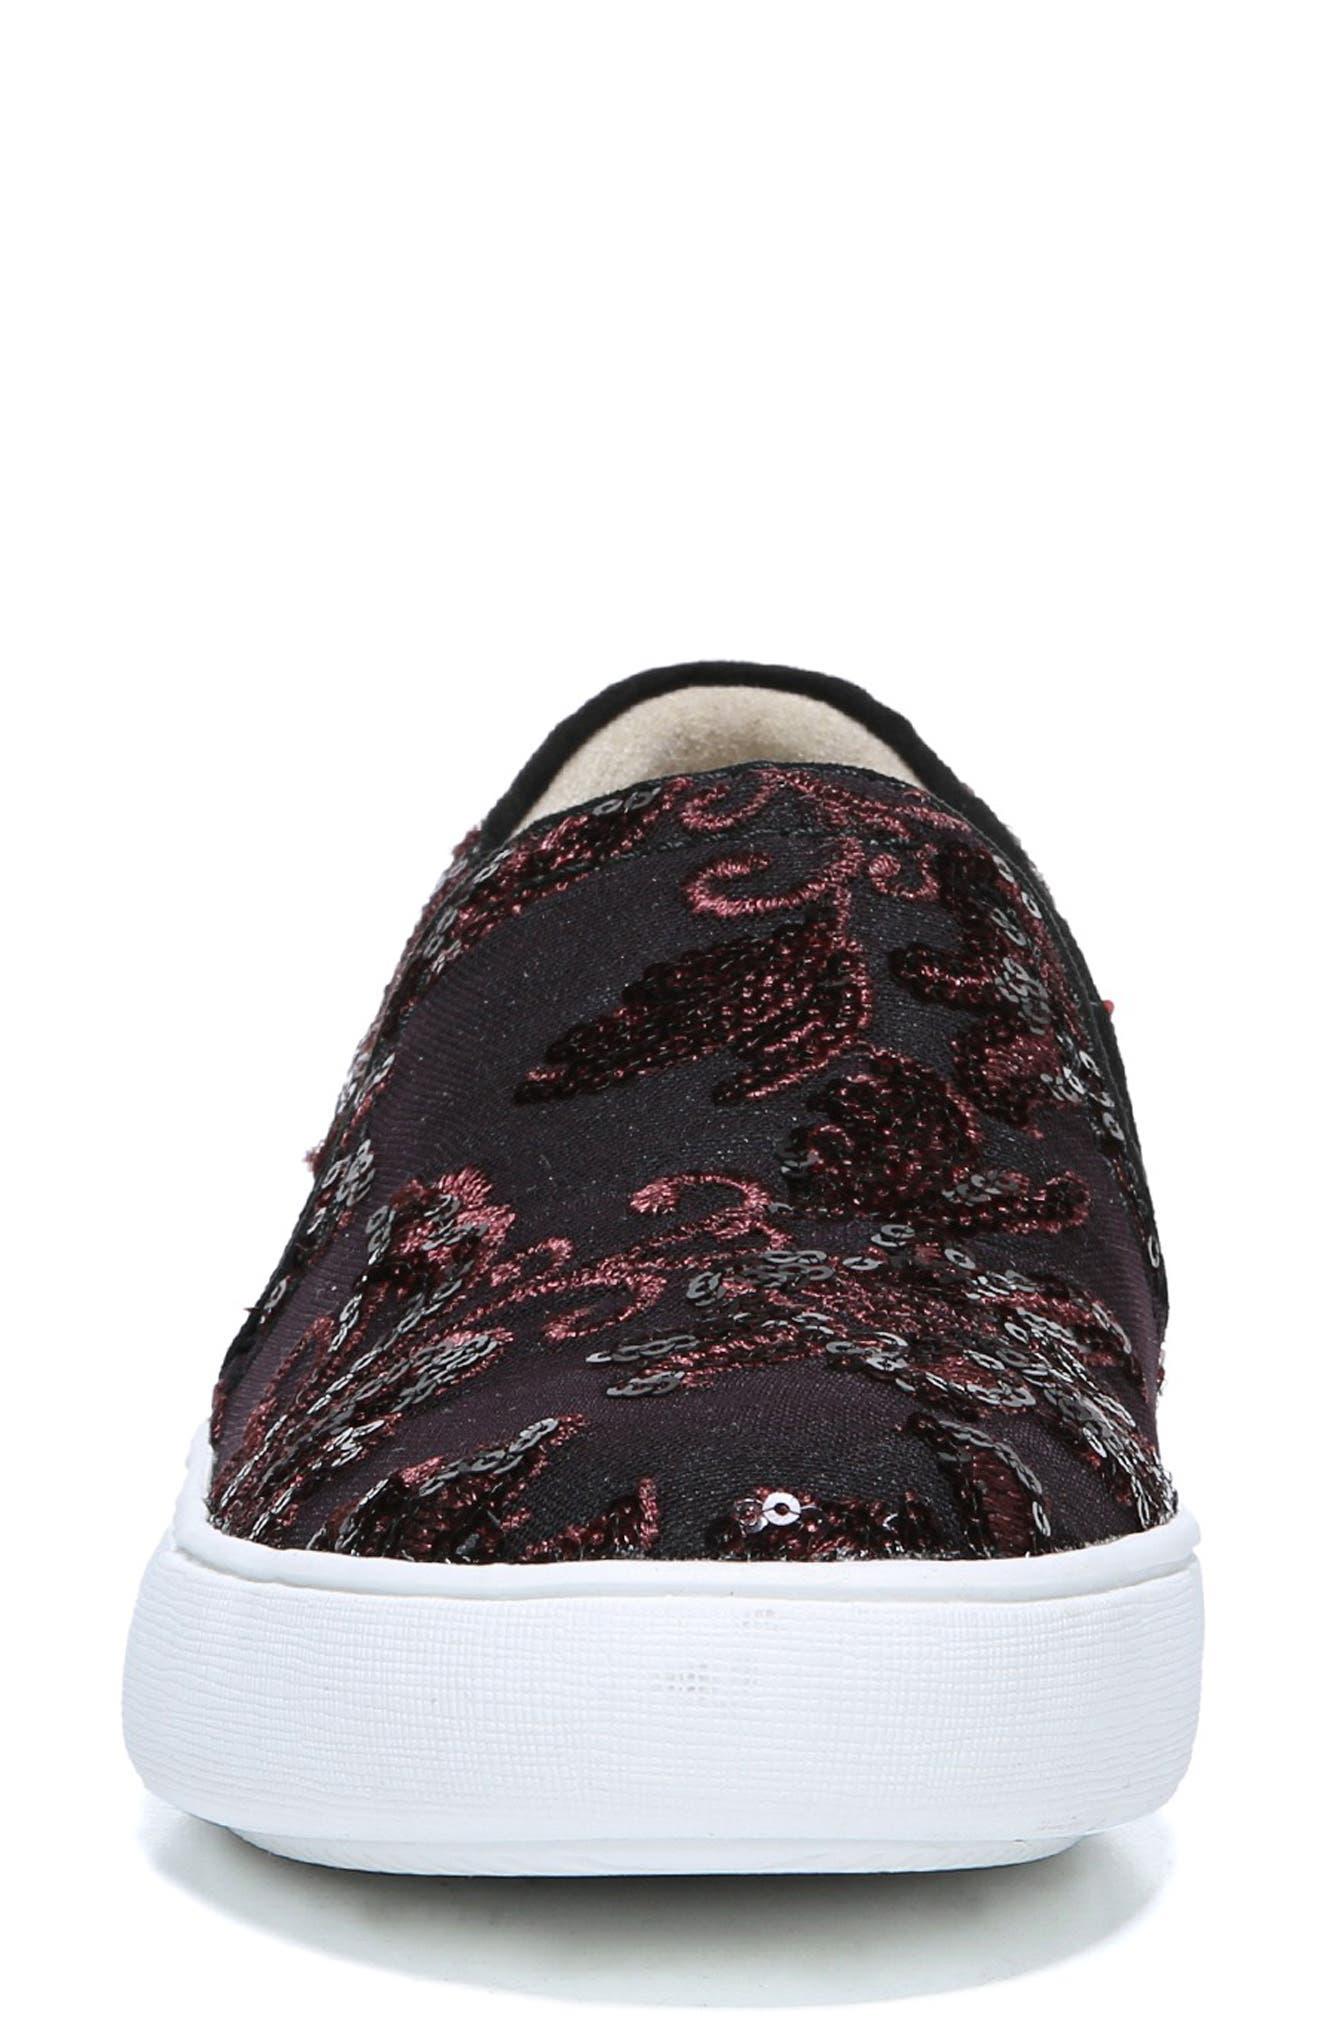 NATURALIZER, Marianne Slip-On Sneaker, Alternate thumbnail 4, color, BURGUNDY EMBROIDERED